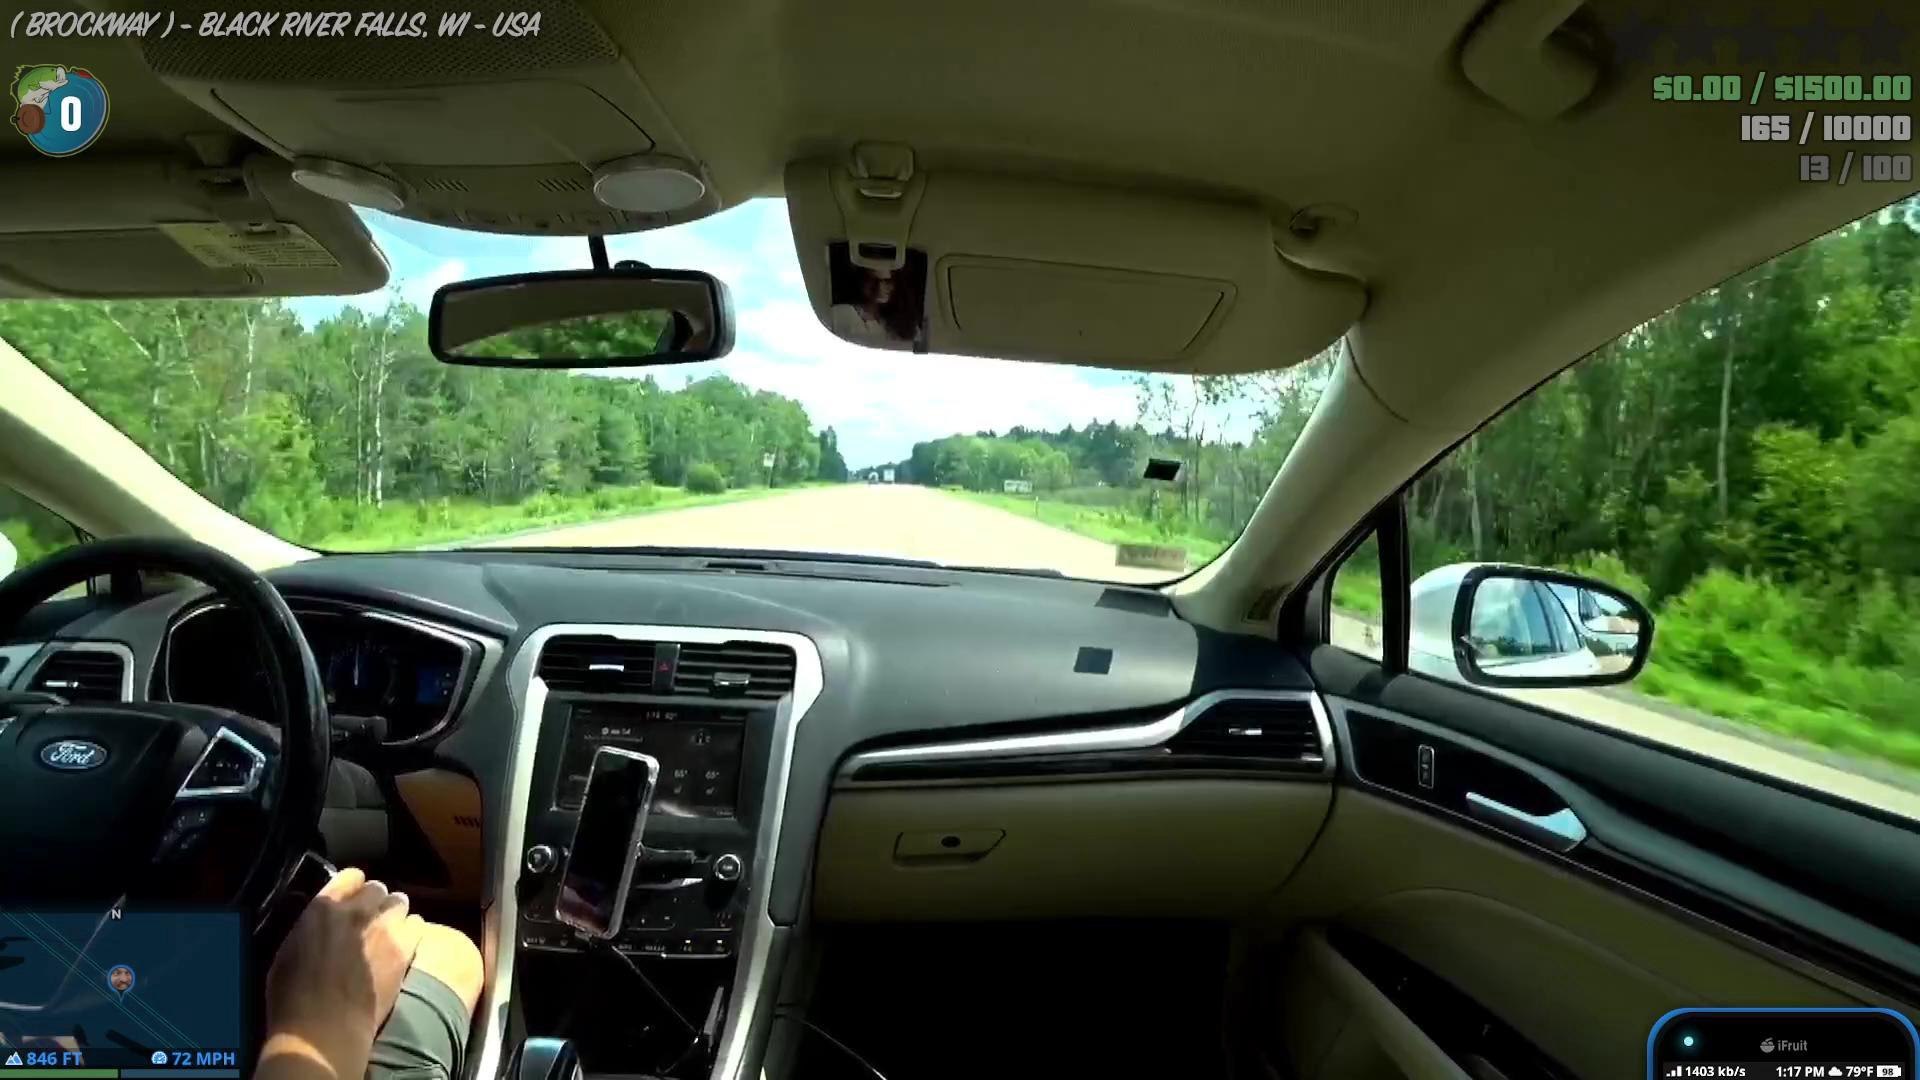 road-trip-to-nowhere-just-chatting-0259-https-t-co-1ru7r76xrl-https-t-co-klblyfjmvy